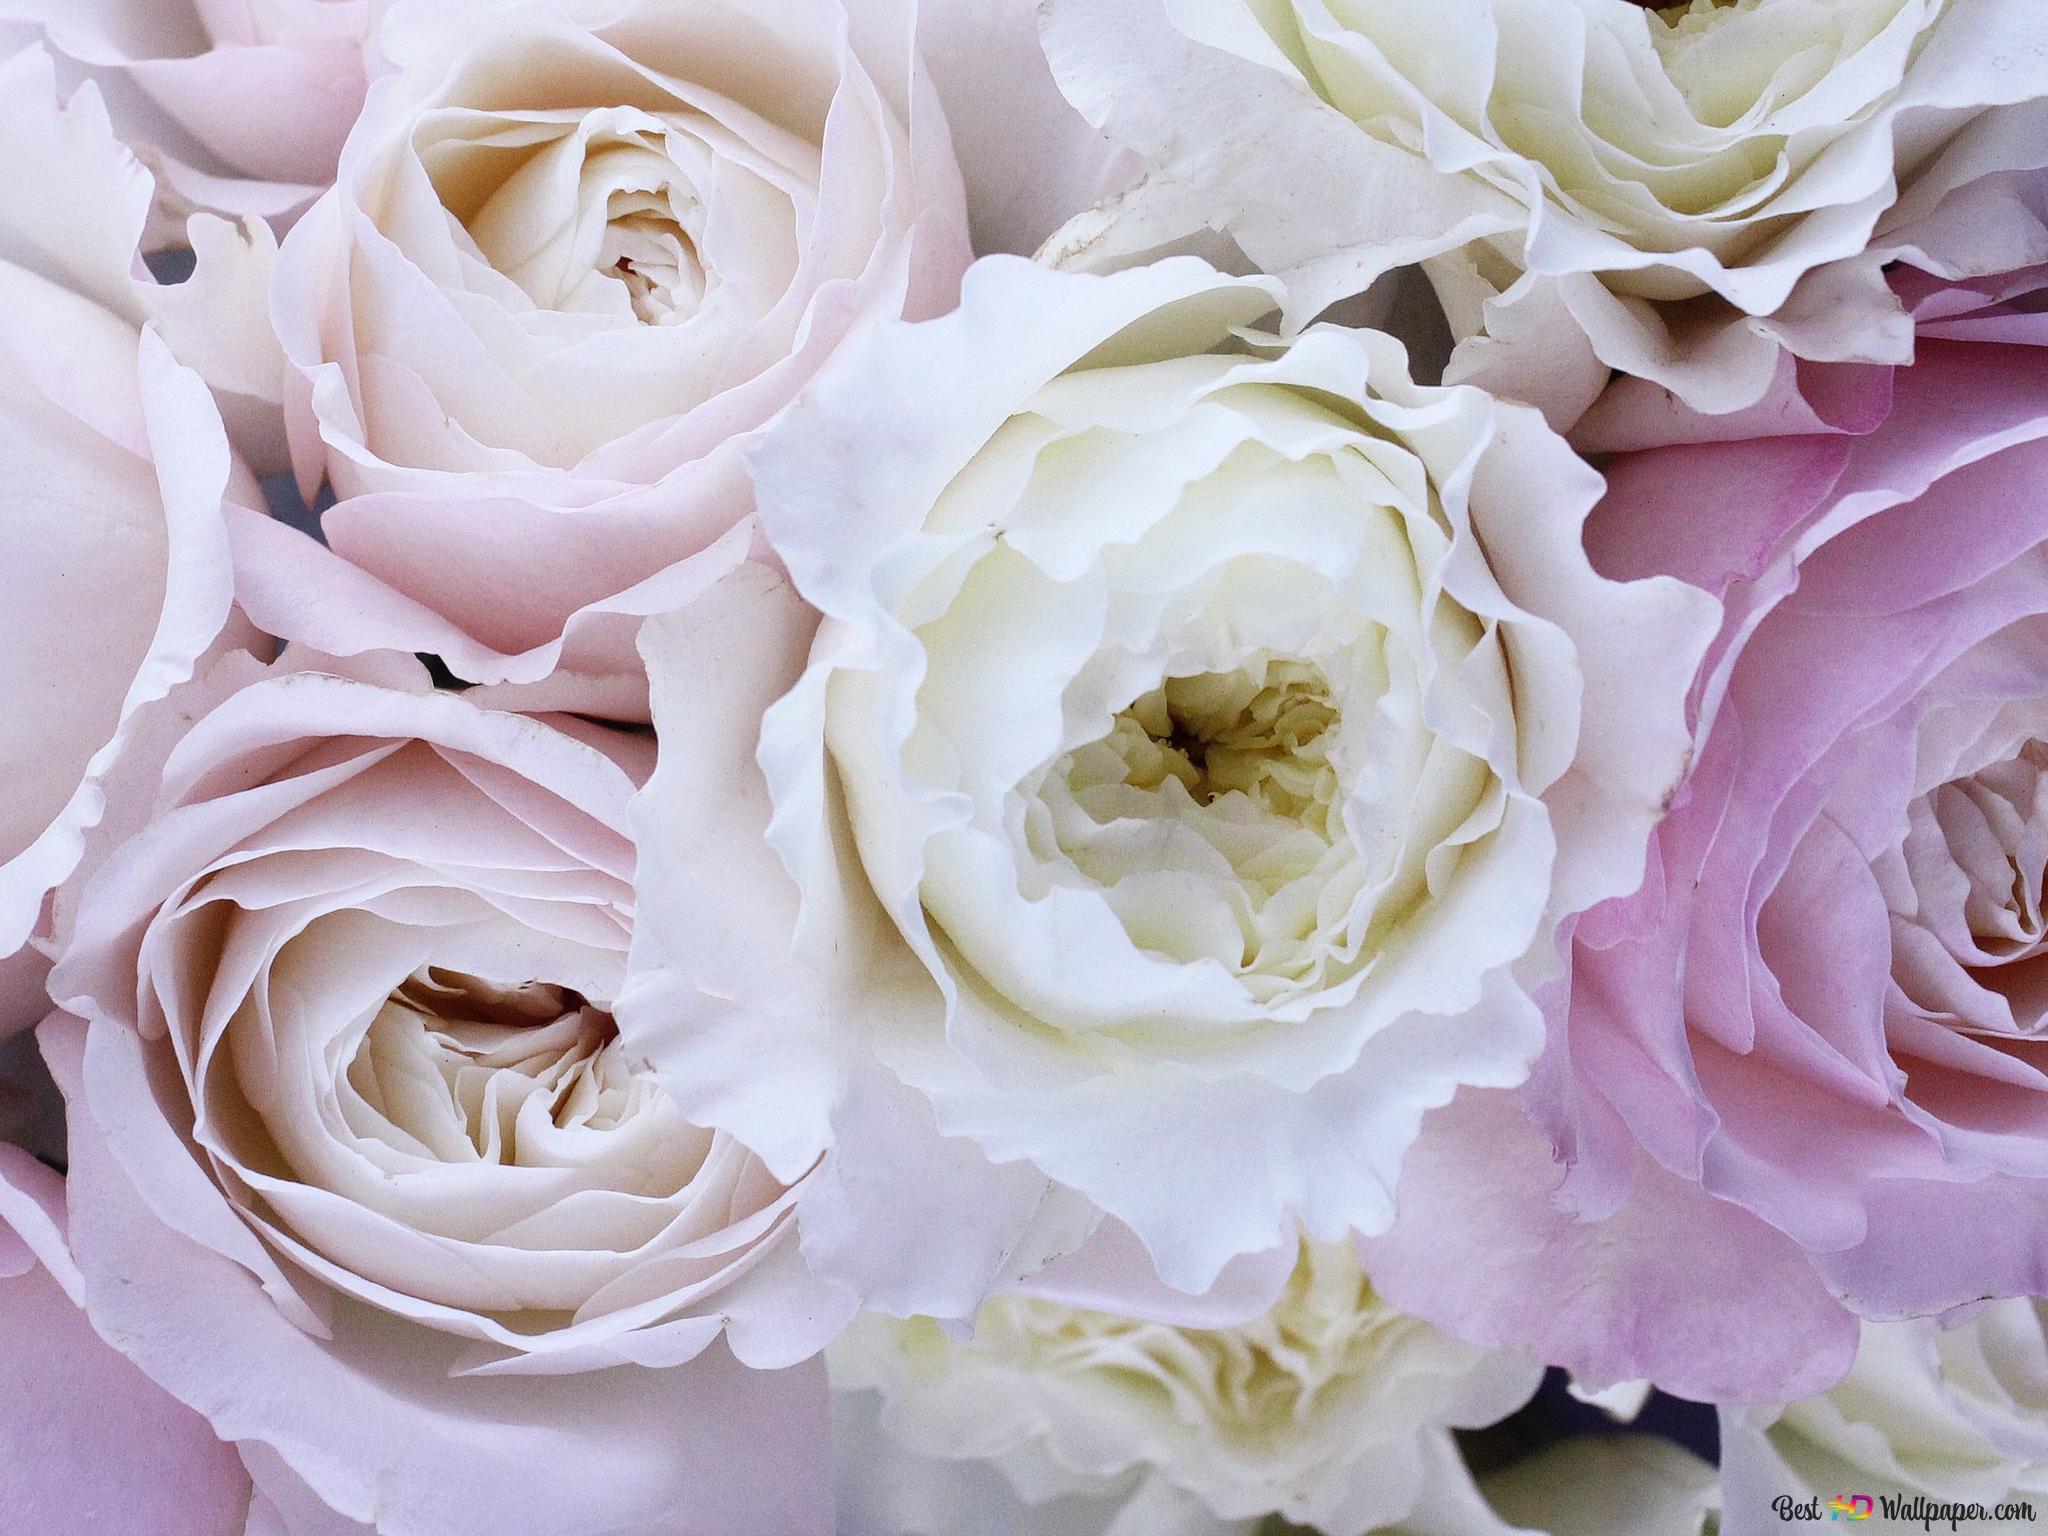 Descargar Fondo De Pantalla Rosas Blancas Hd